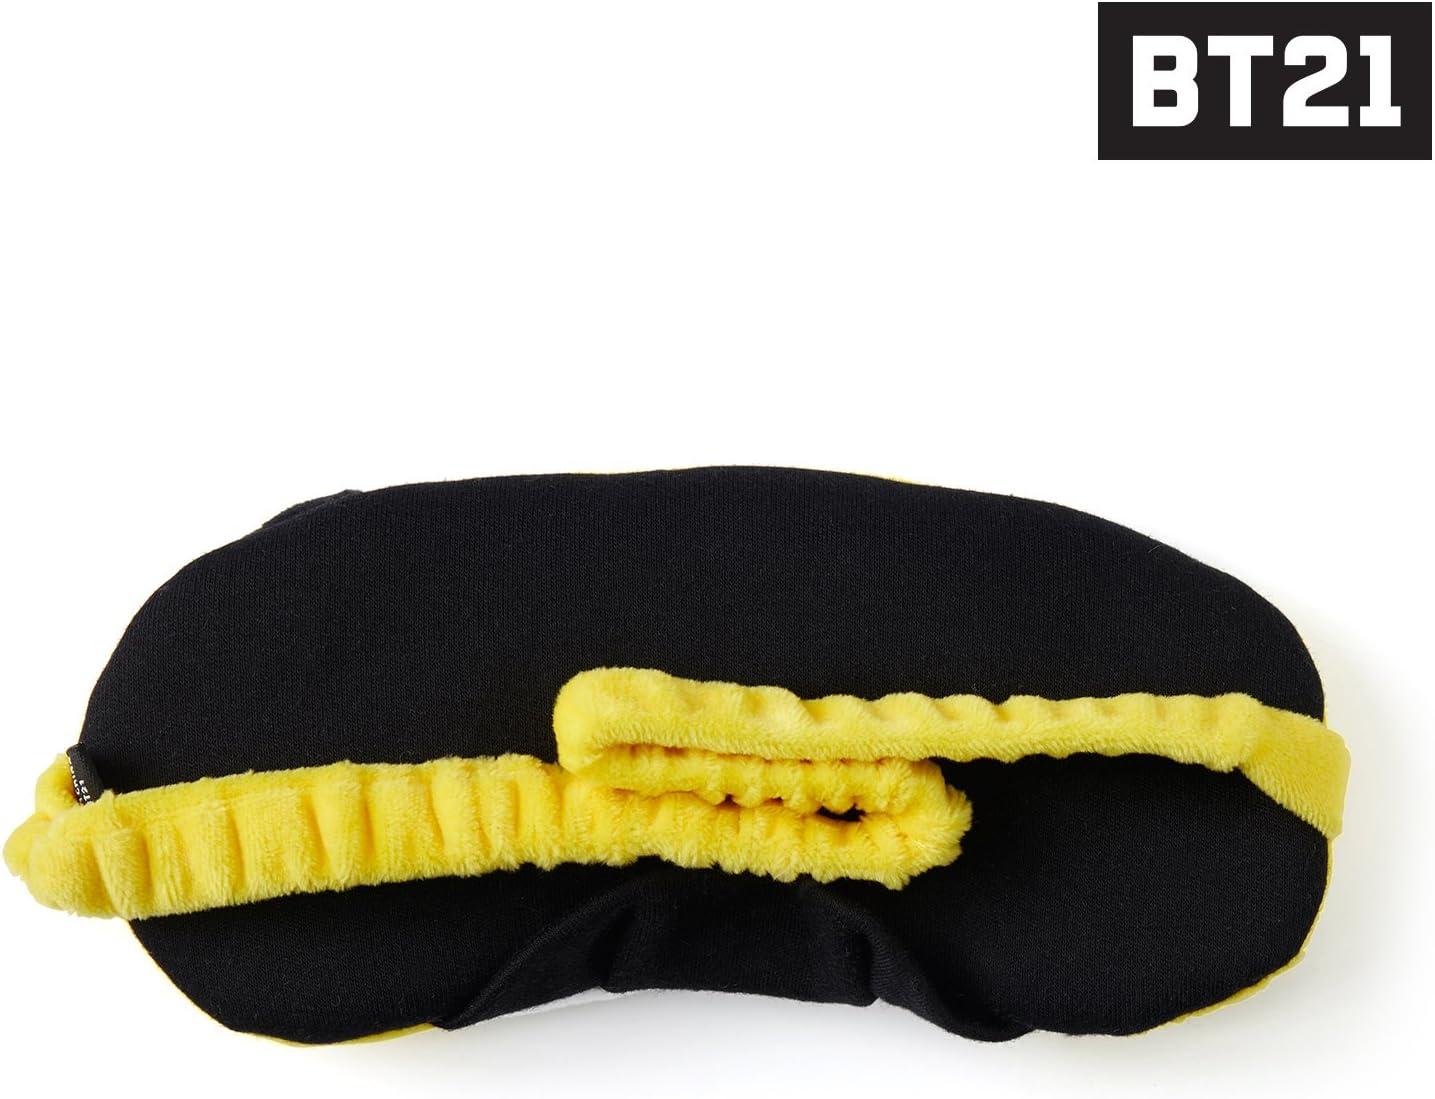 BT21 Official Merchandise by Line Friends CHIMMY Character Eye Sleep Mask for Men /& Women